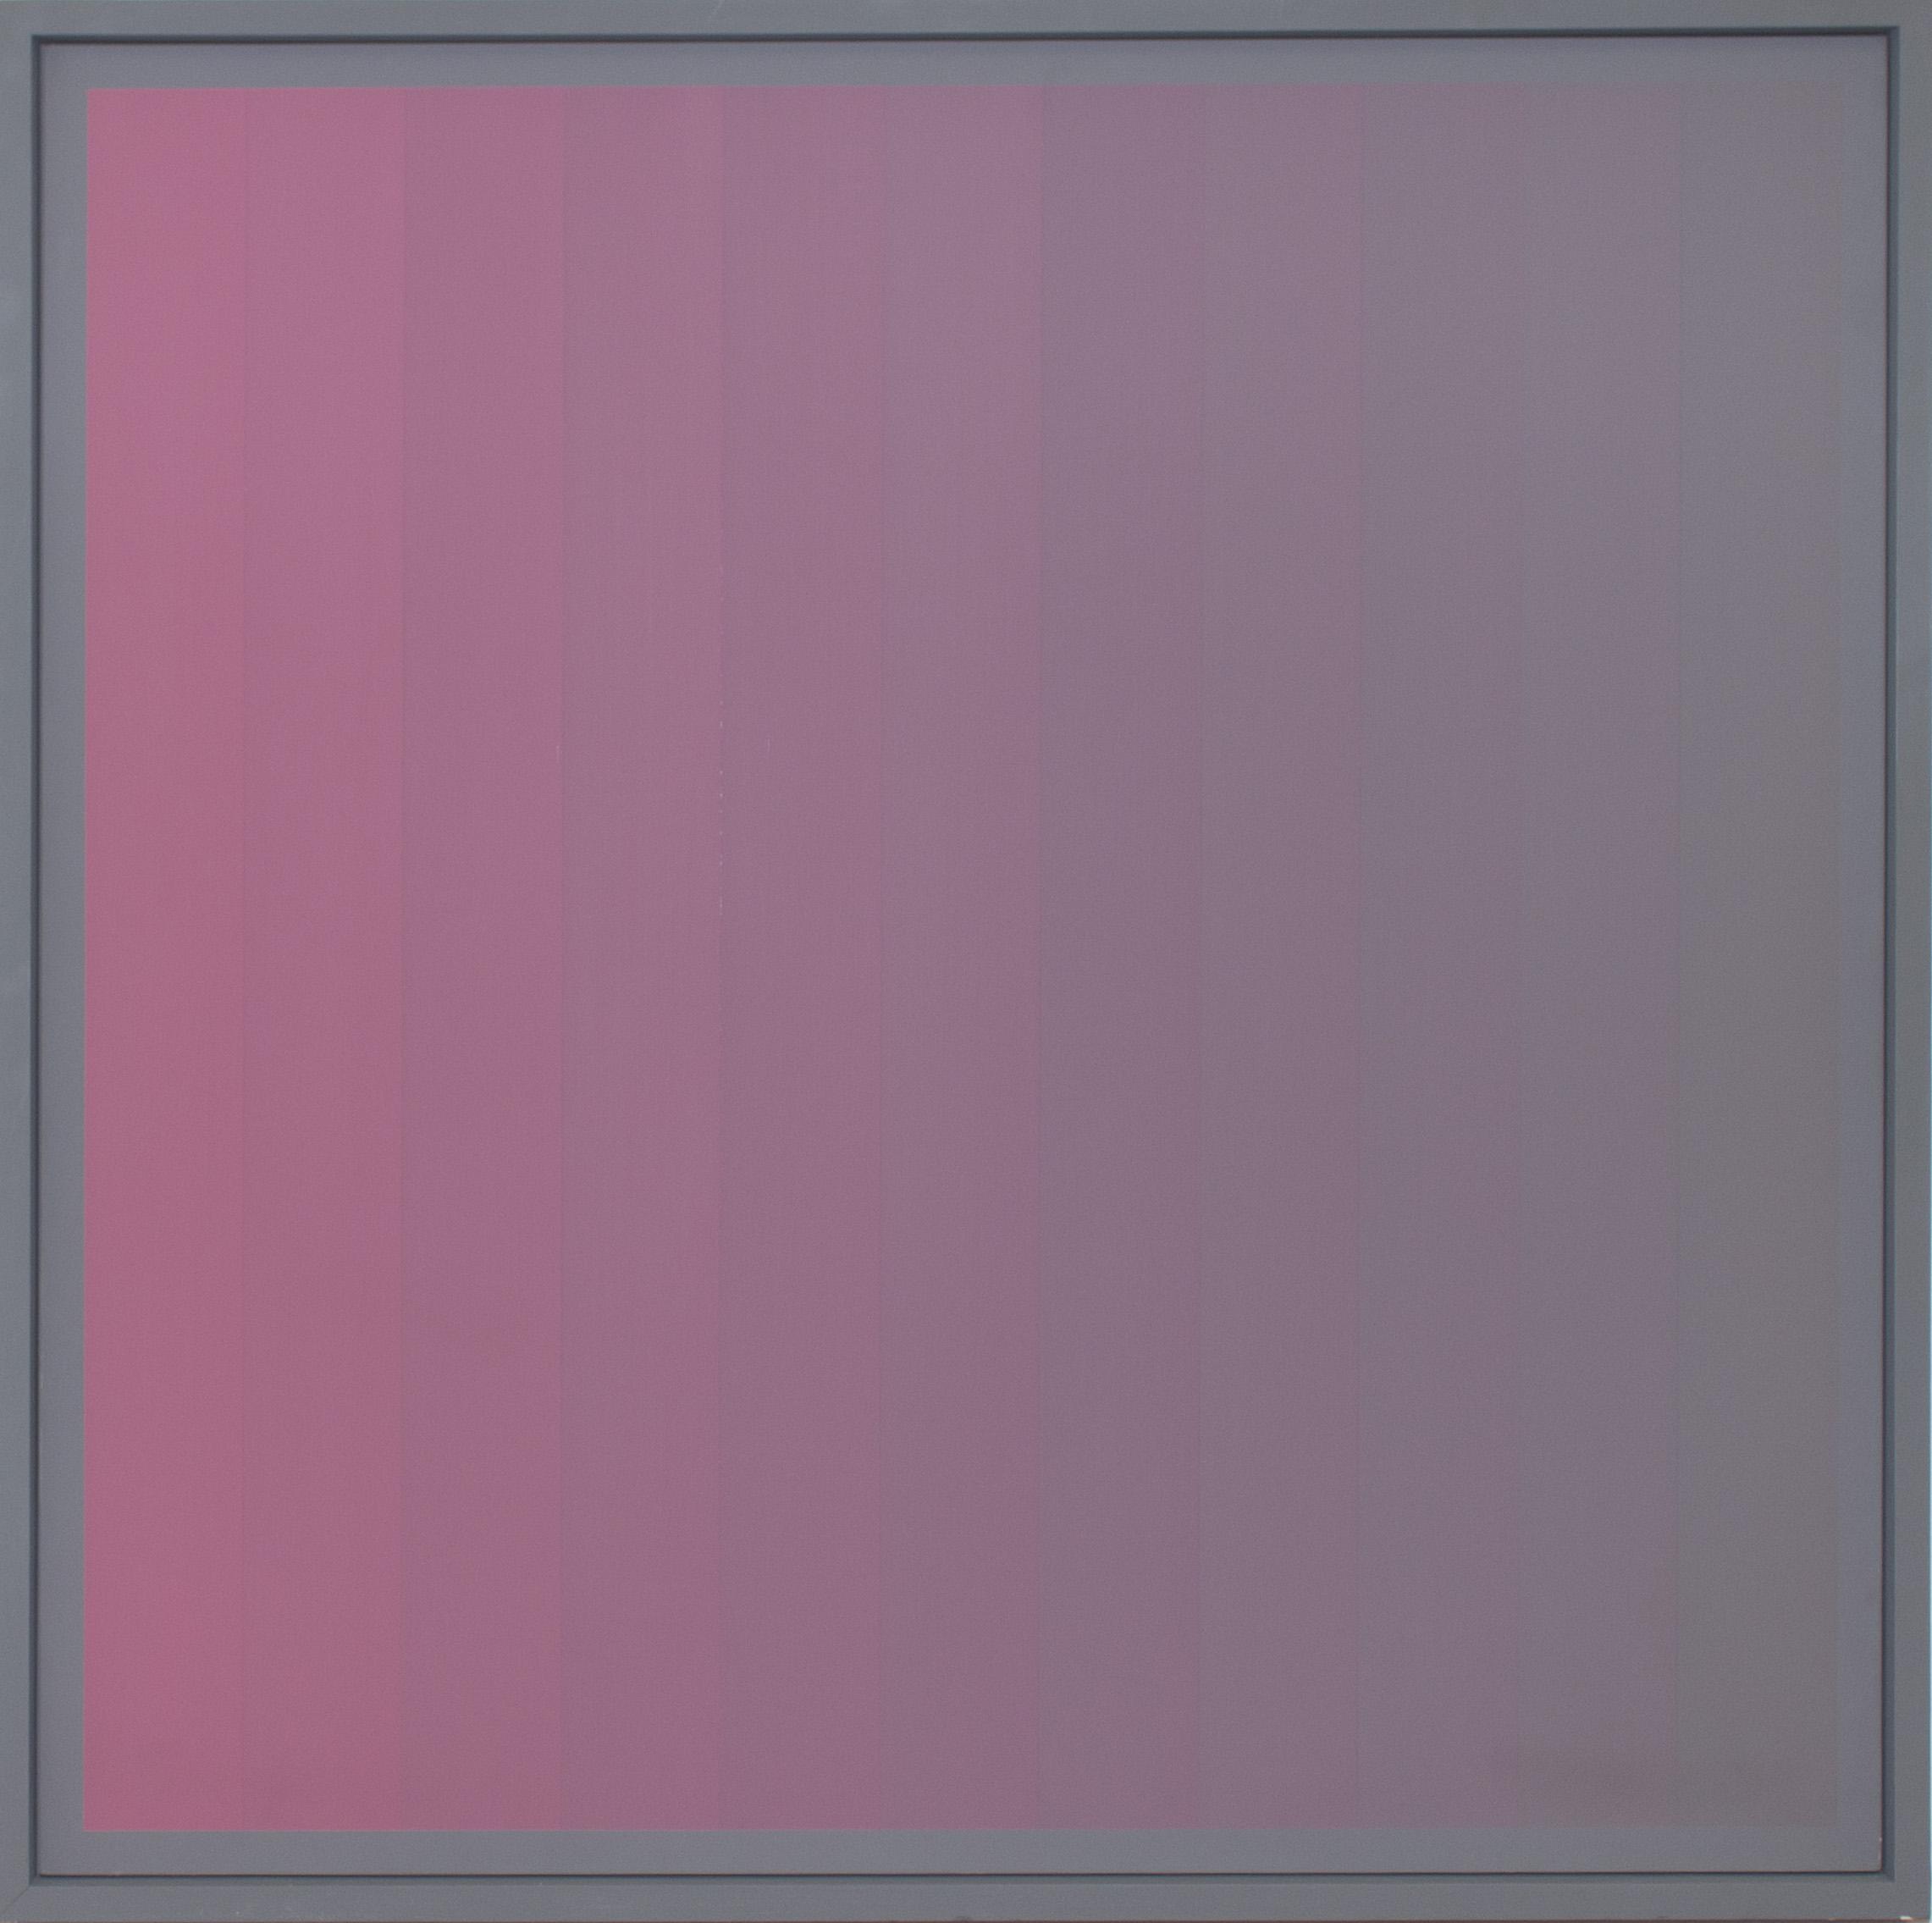 K267 - 100 x 100 cm, Alkydharzfarbe auf Phenapan